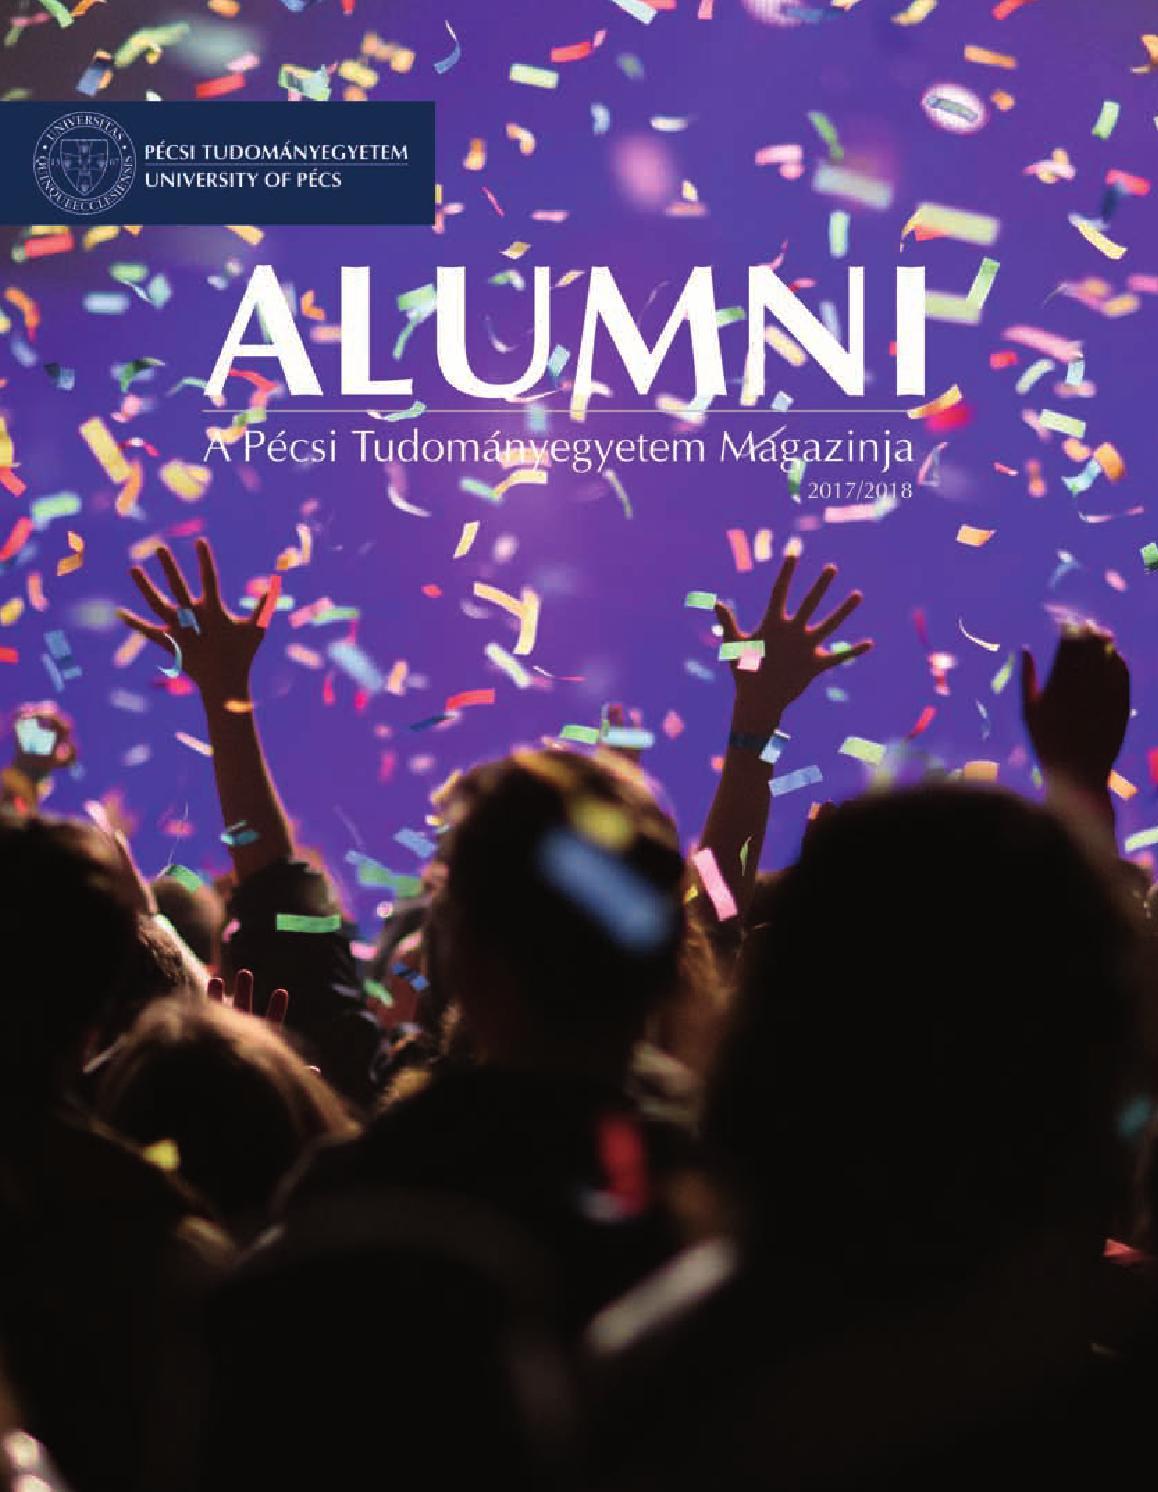 192eb9a2d9 Alumni magazin 2017 by UnivPécs - issuu